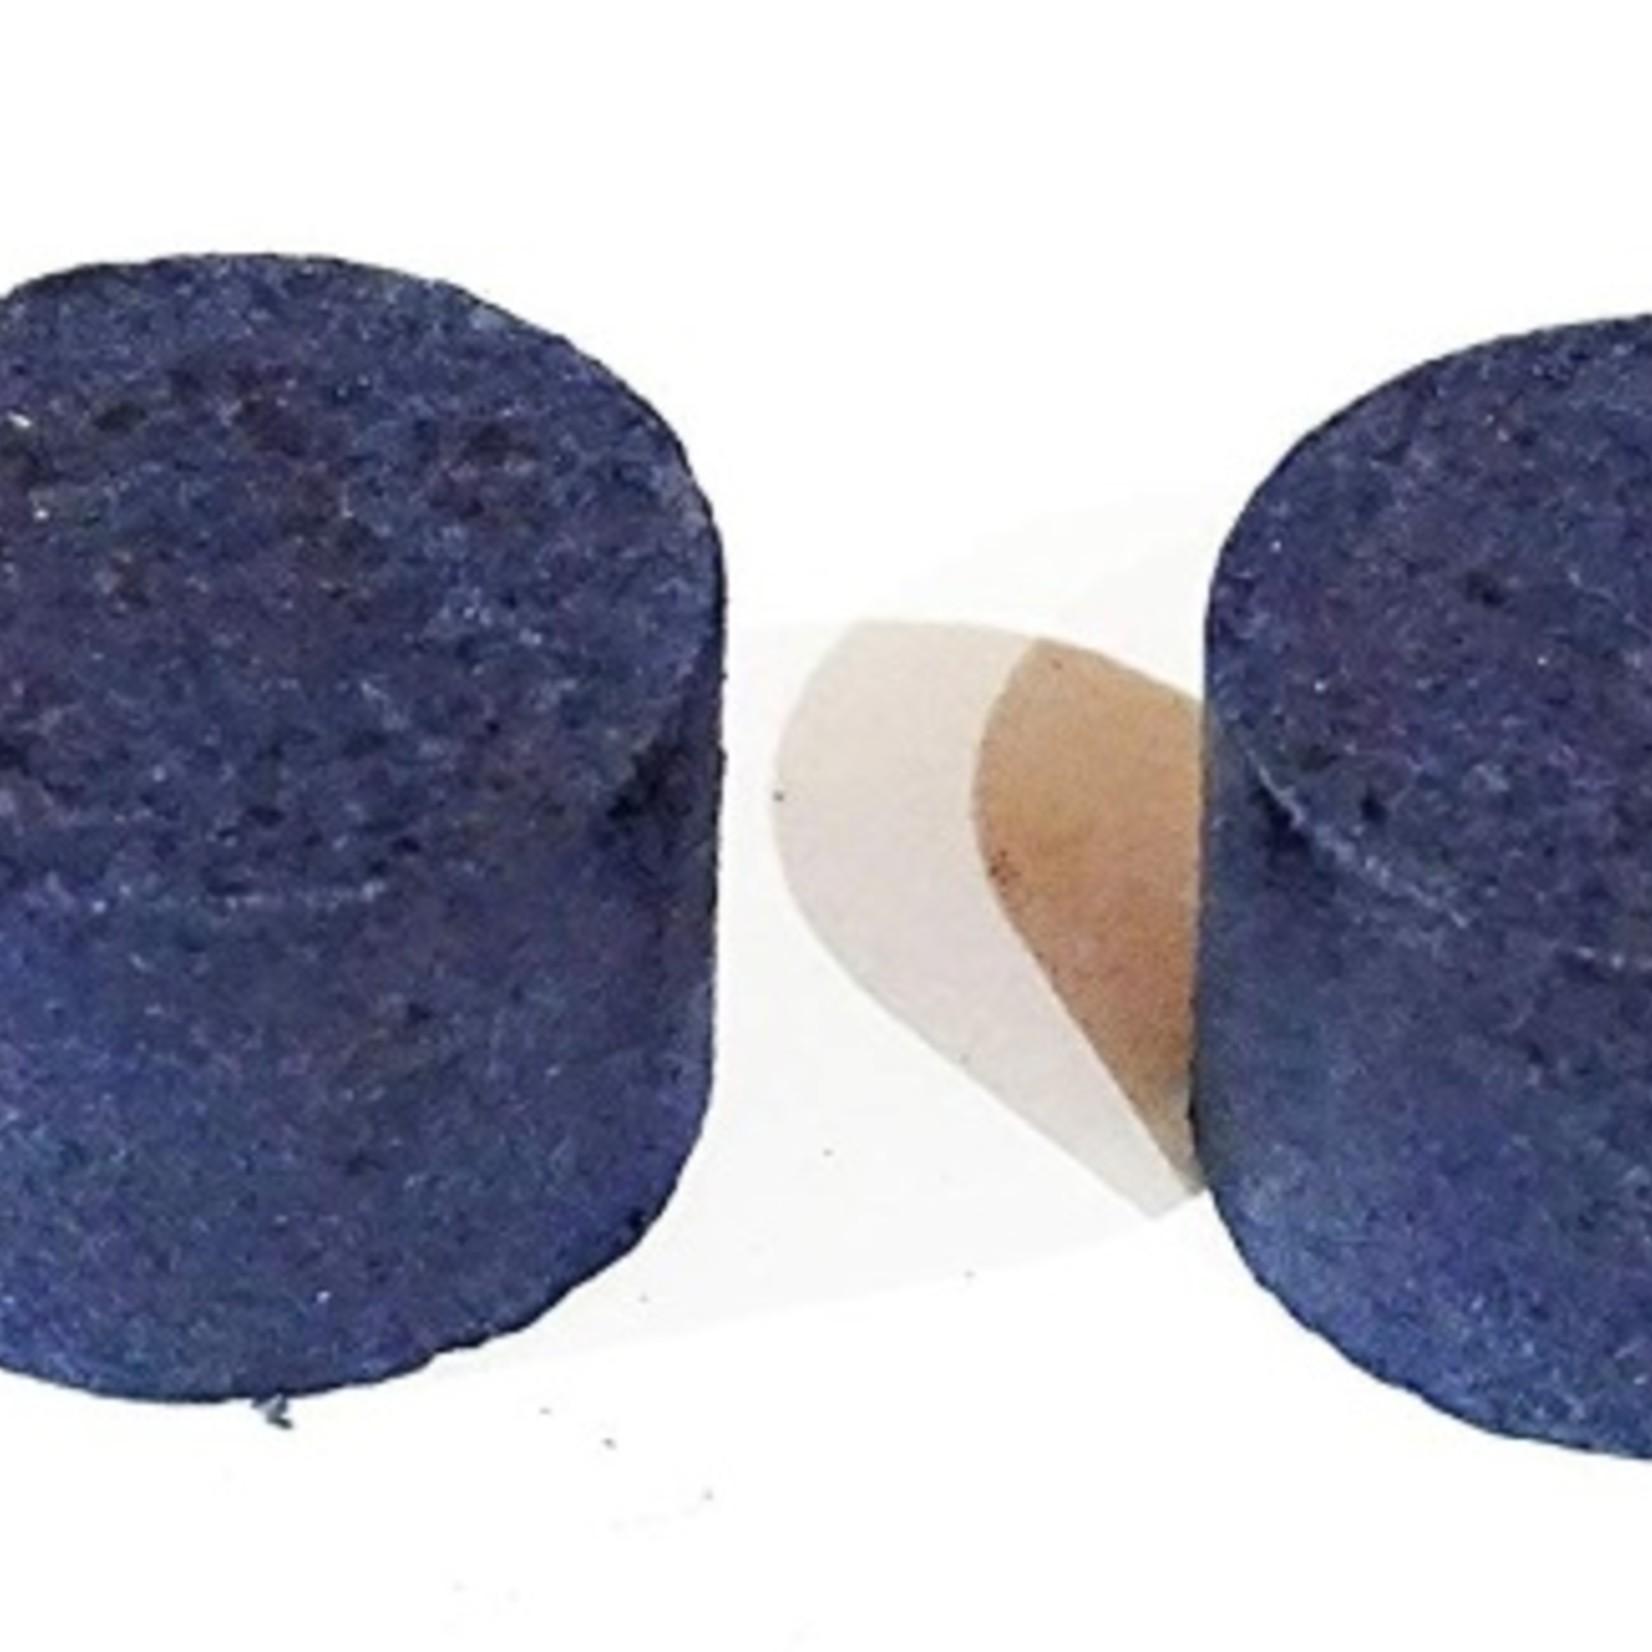 LARGE BLUE SMOKE PELLETS